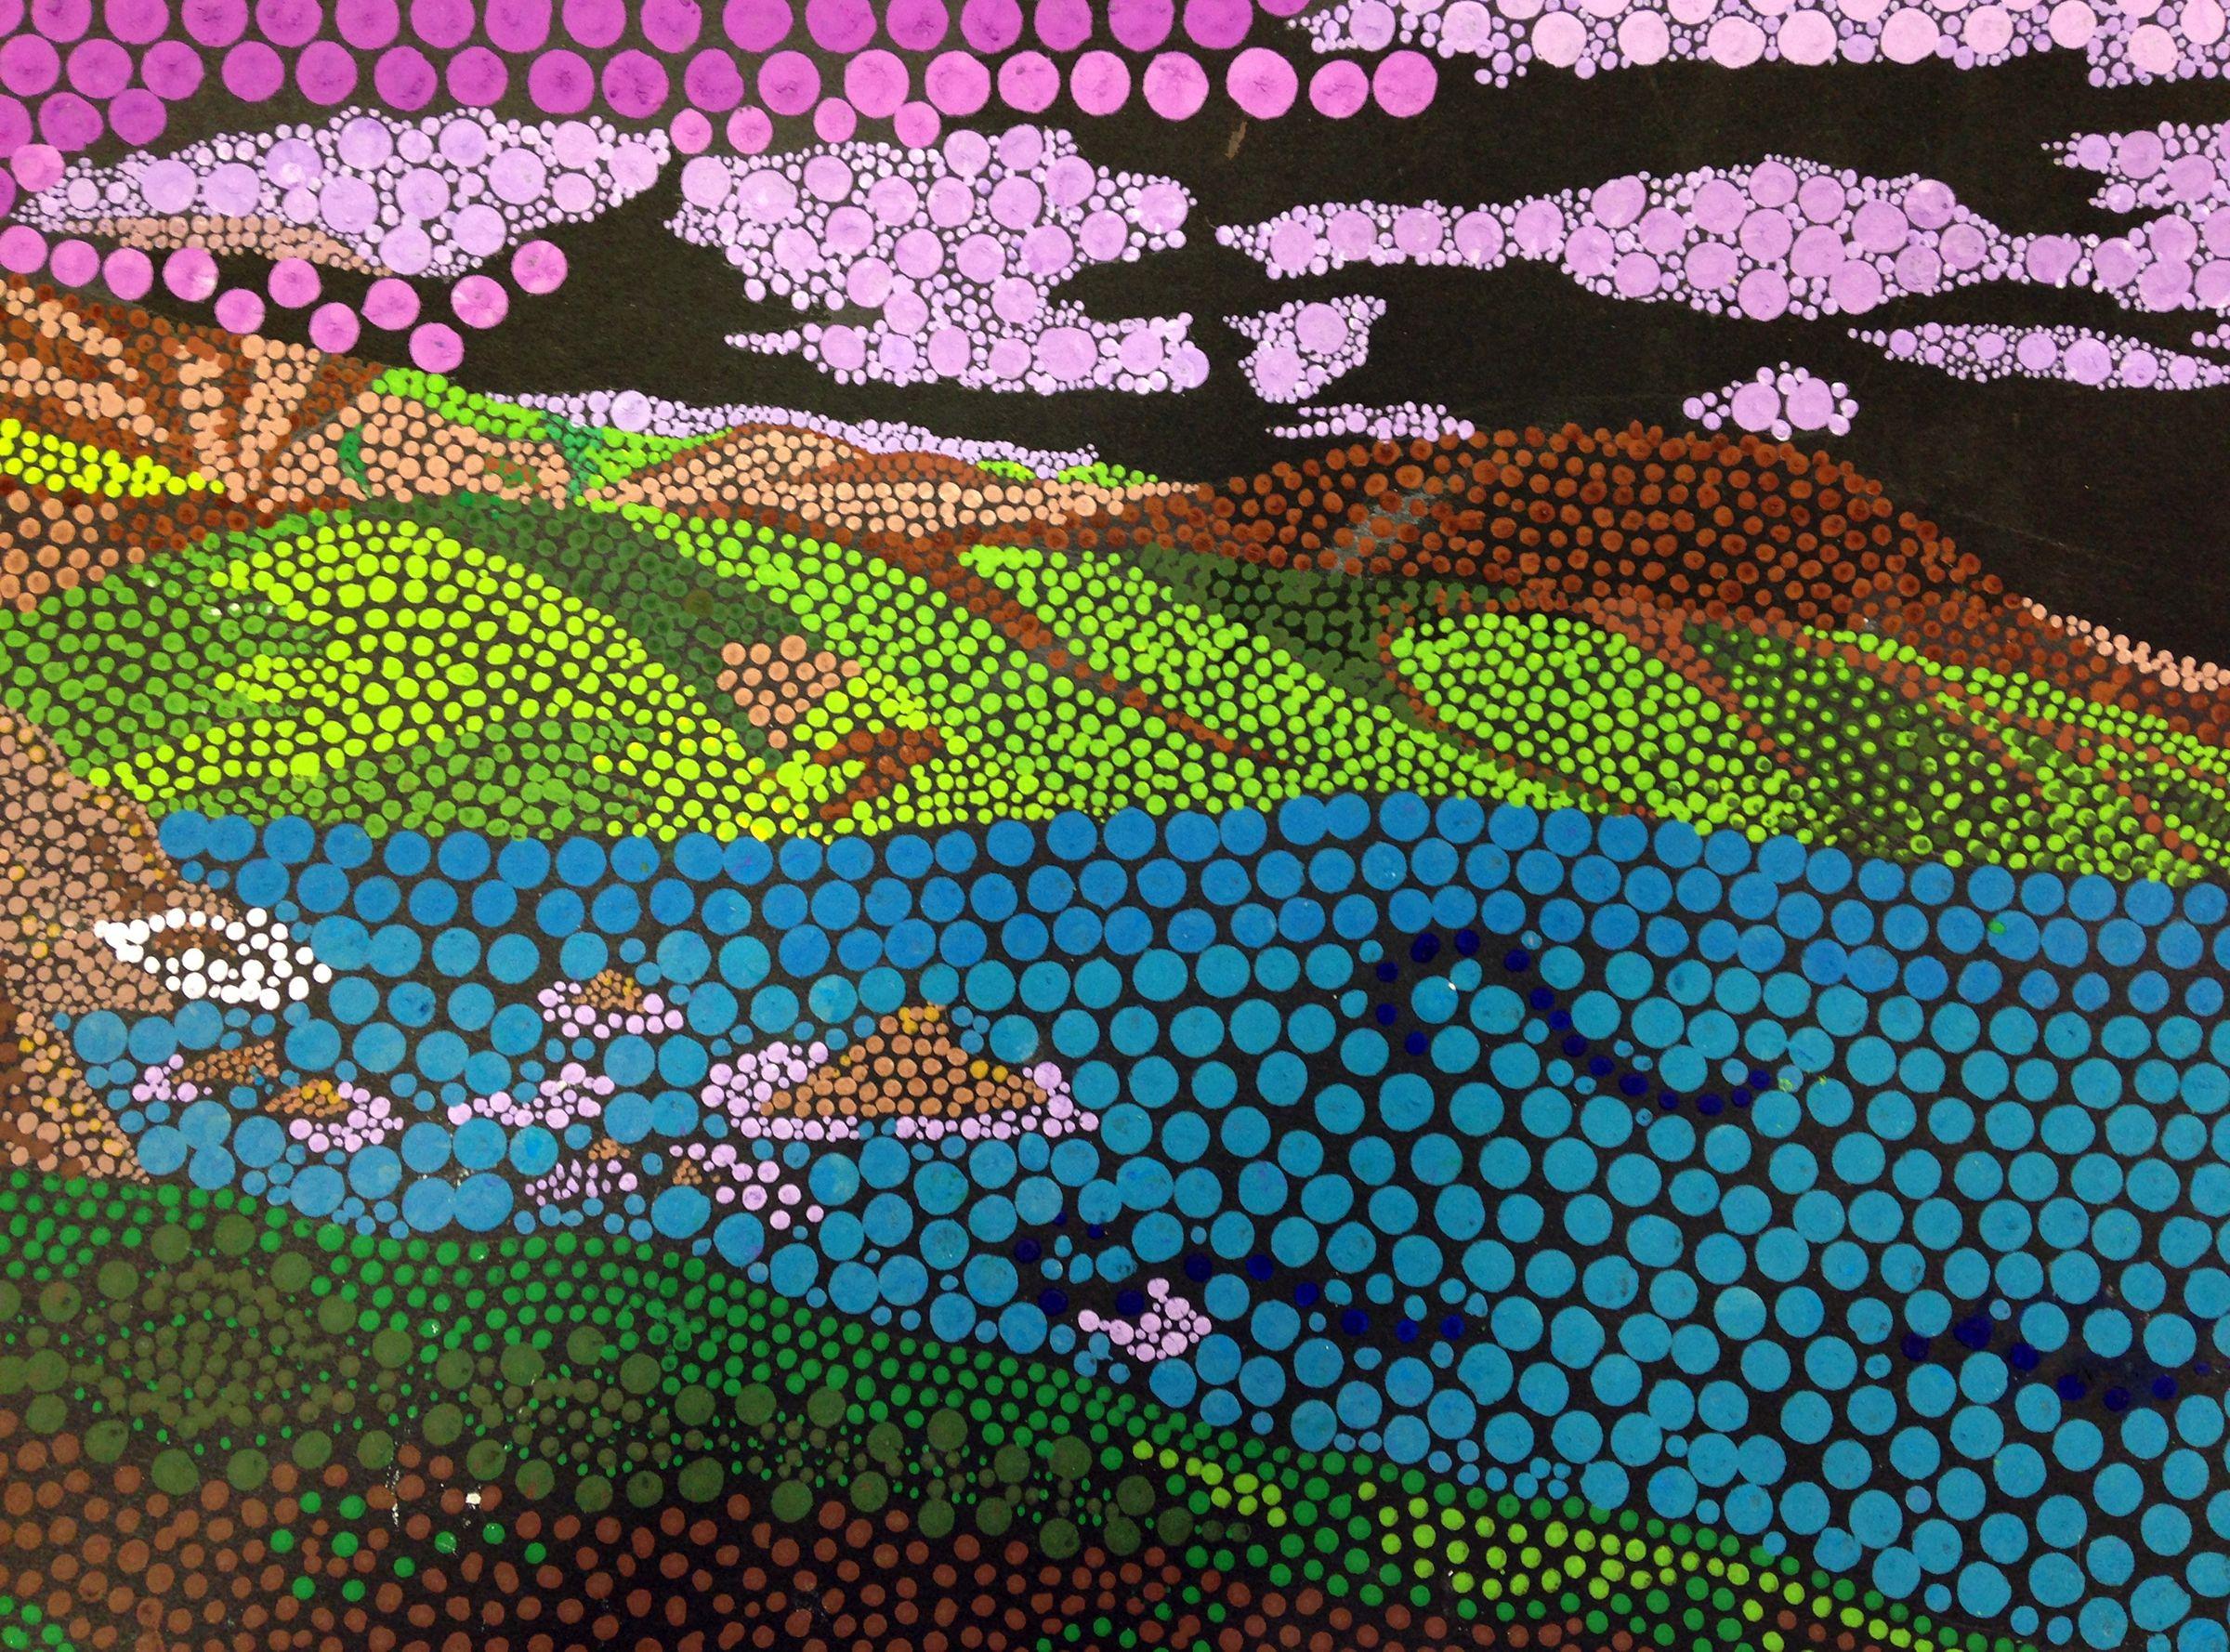 Pin By Anne Cameron Krenselewski On Student Artwork